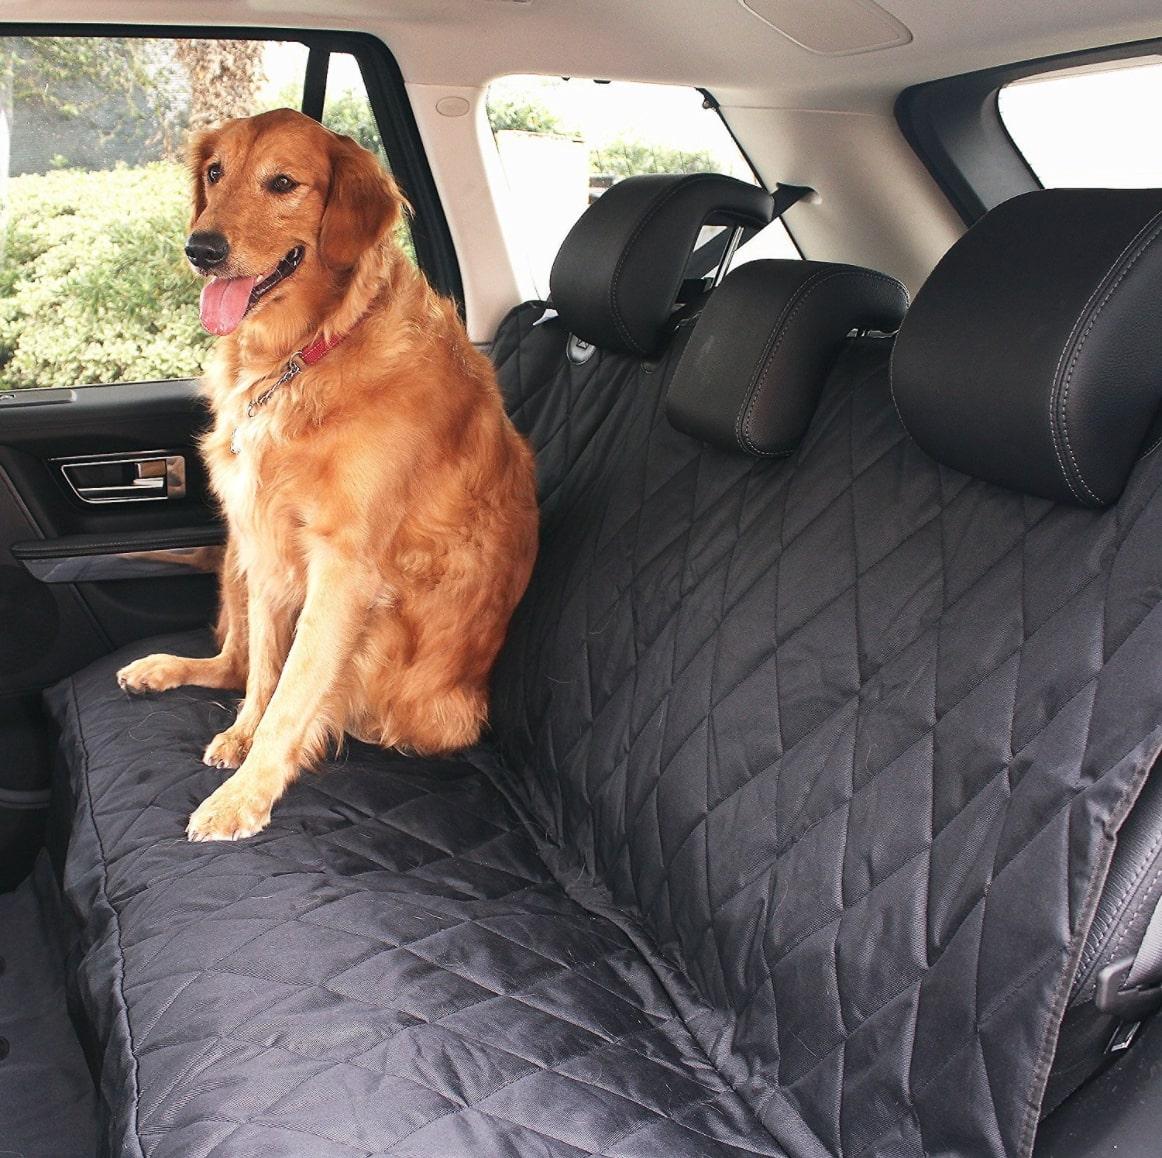 BarksBar Luxury Waterproof Car Seat Cover